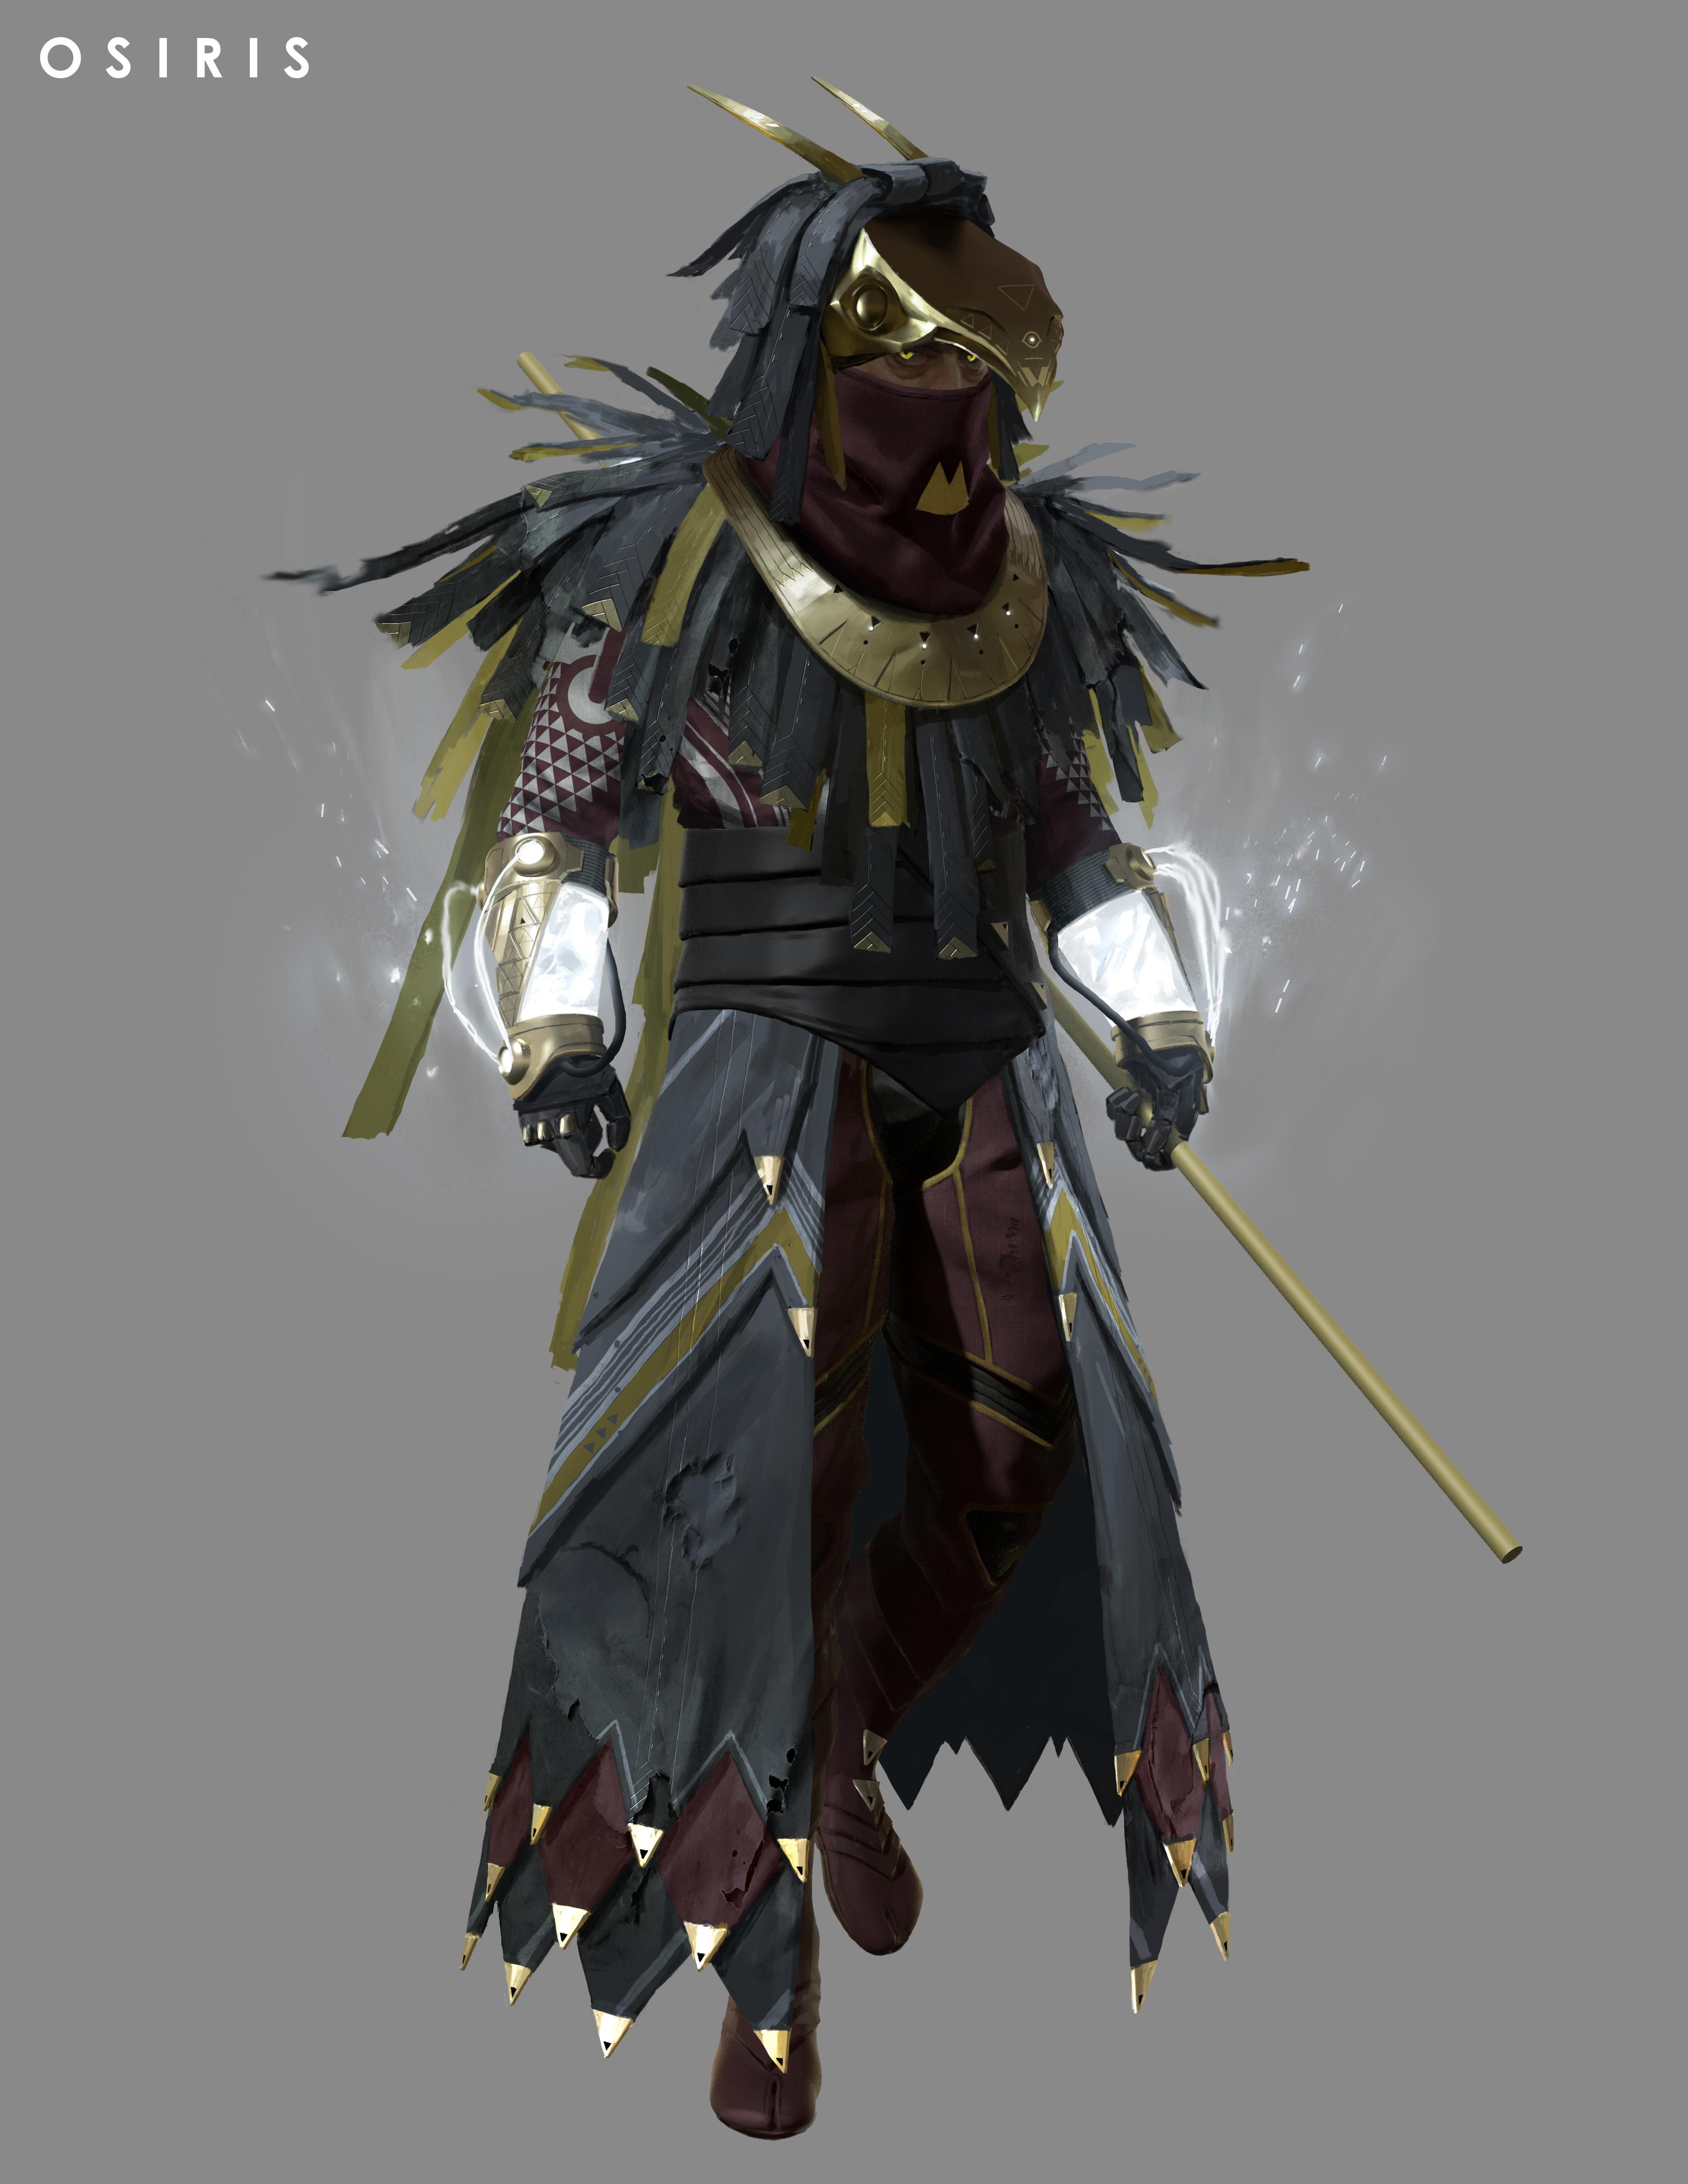 Destiny 2 The Curse of Osiris Announcement